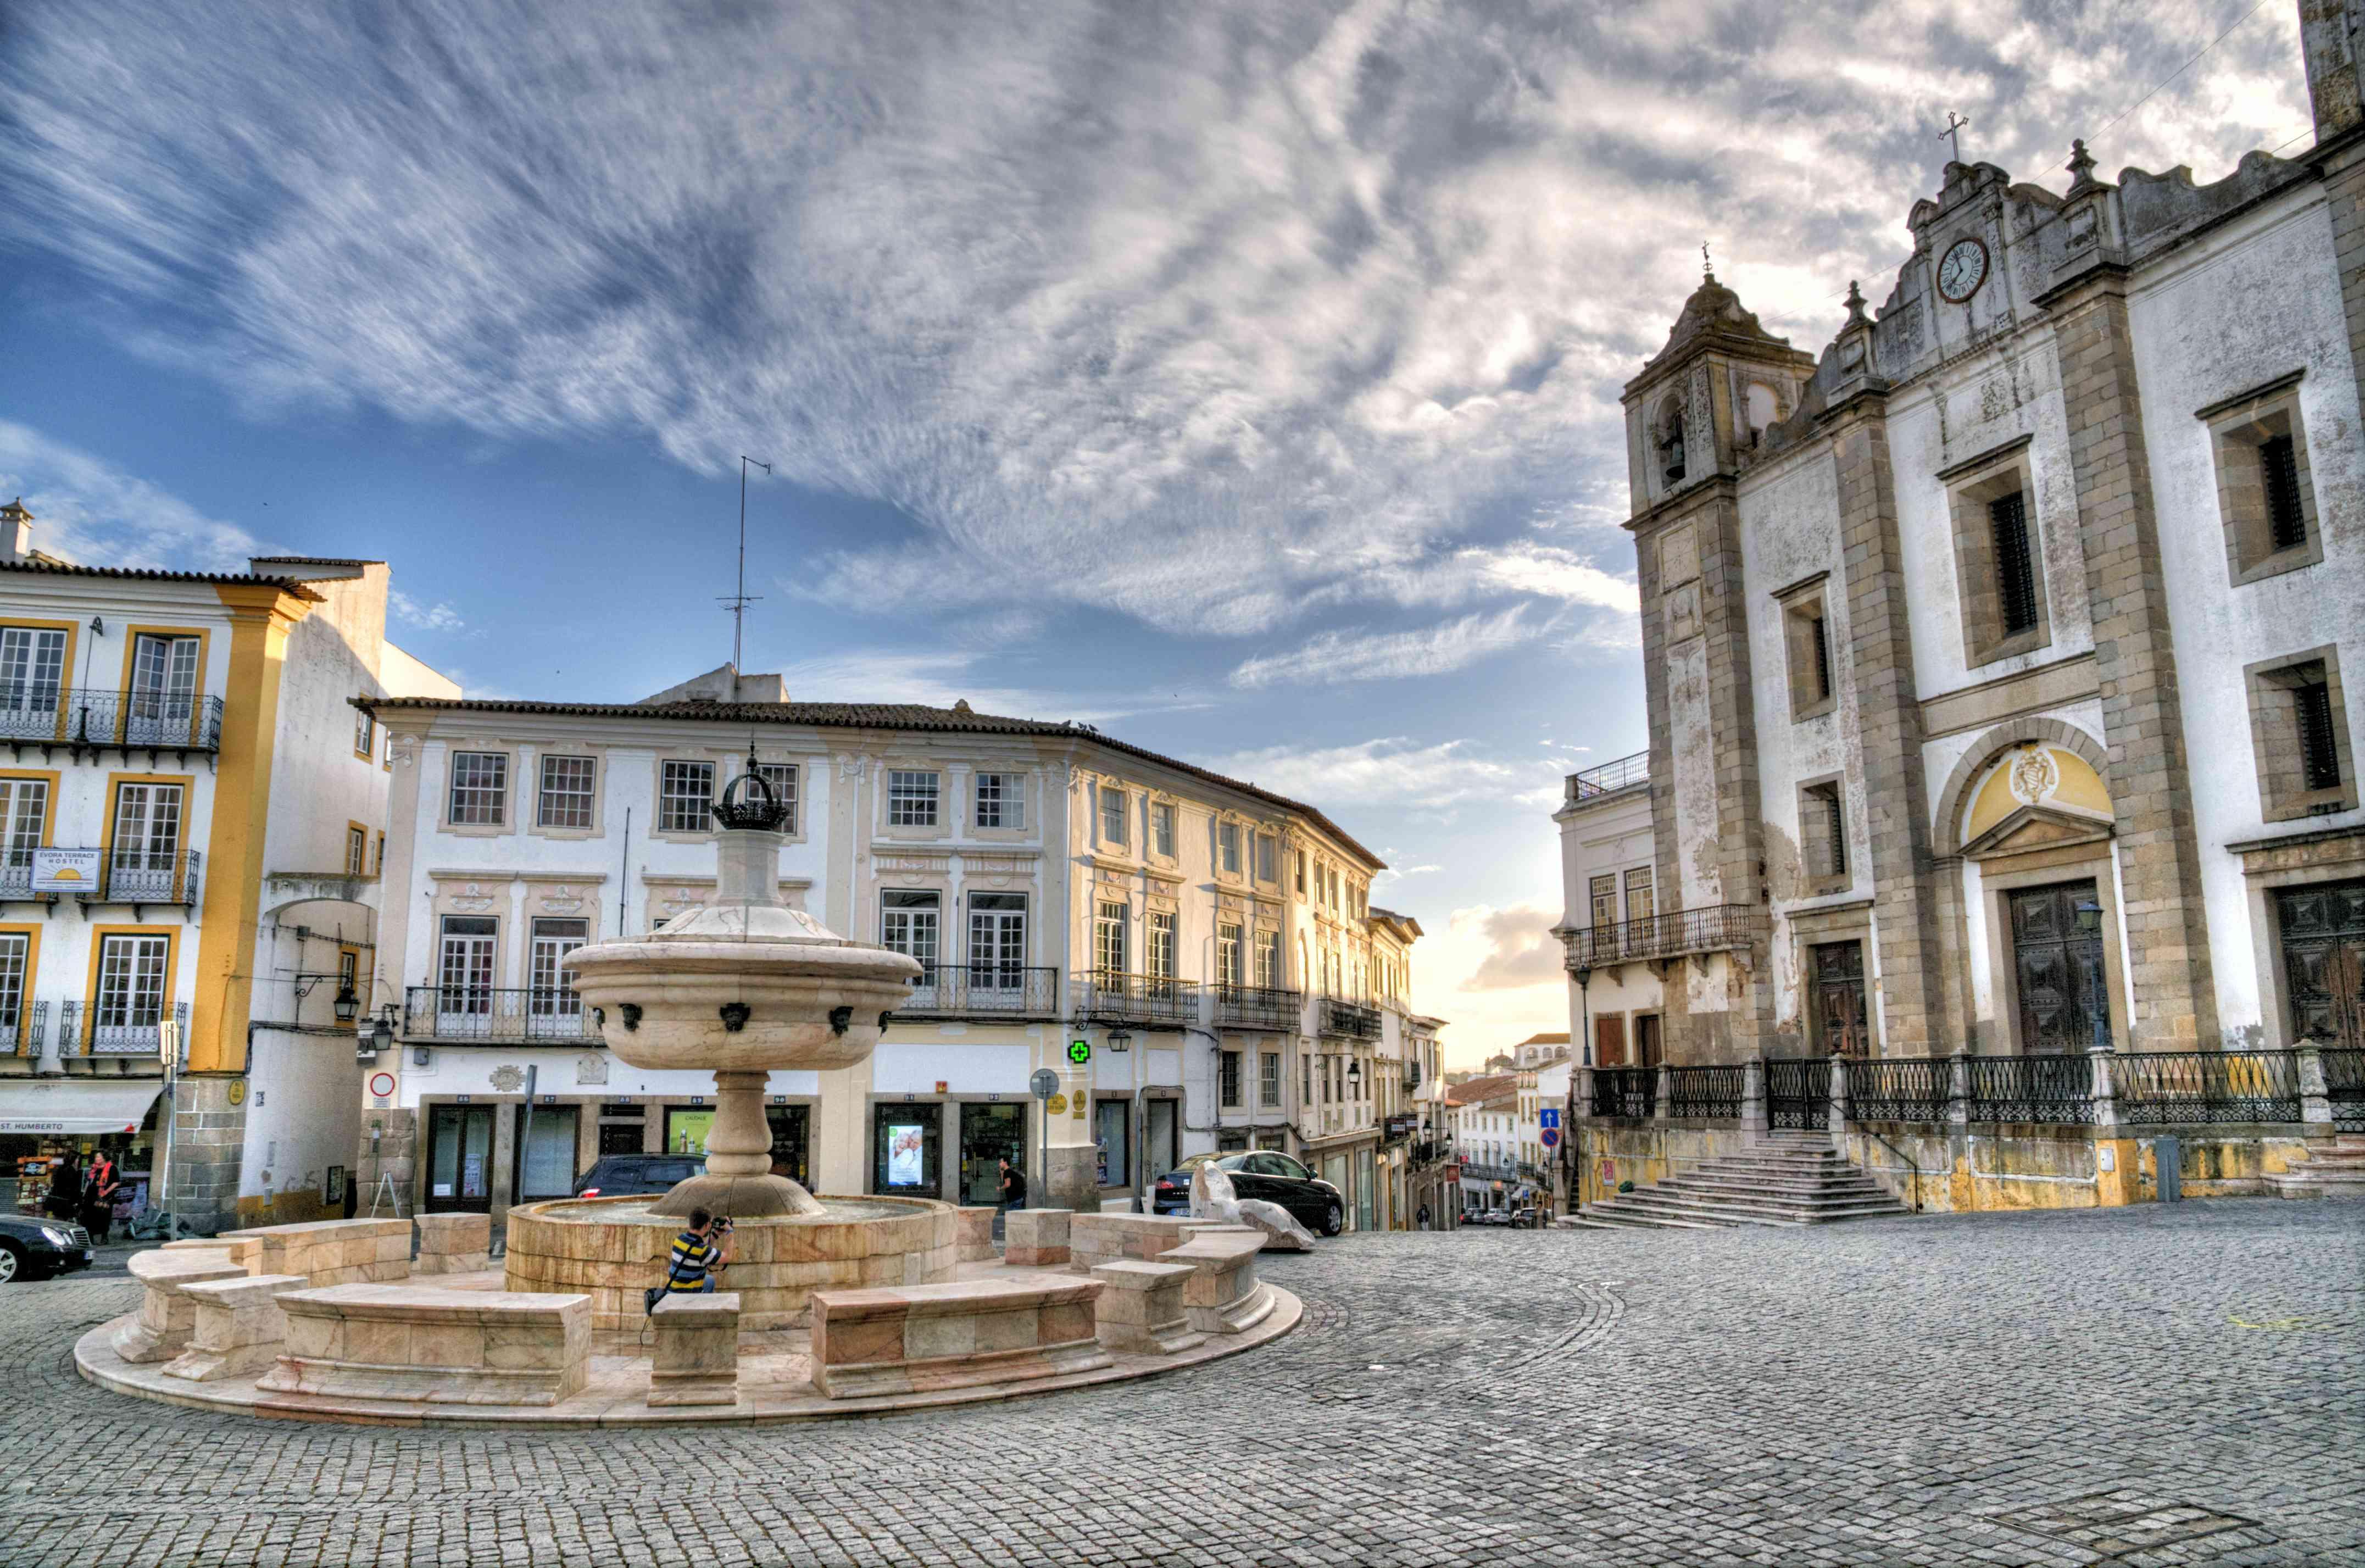 Fountain in baroque style in the Praça do Giraldo Square in Évora, Portugal